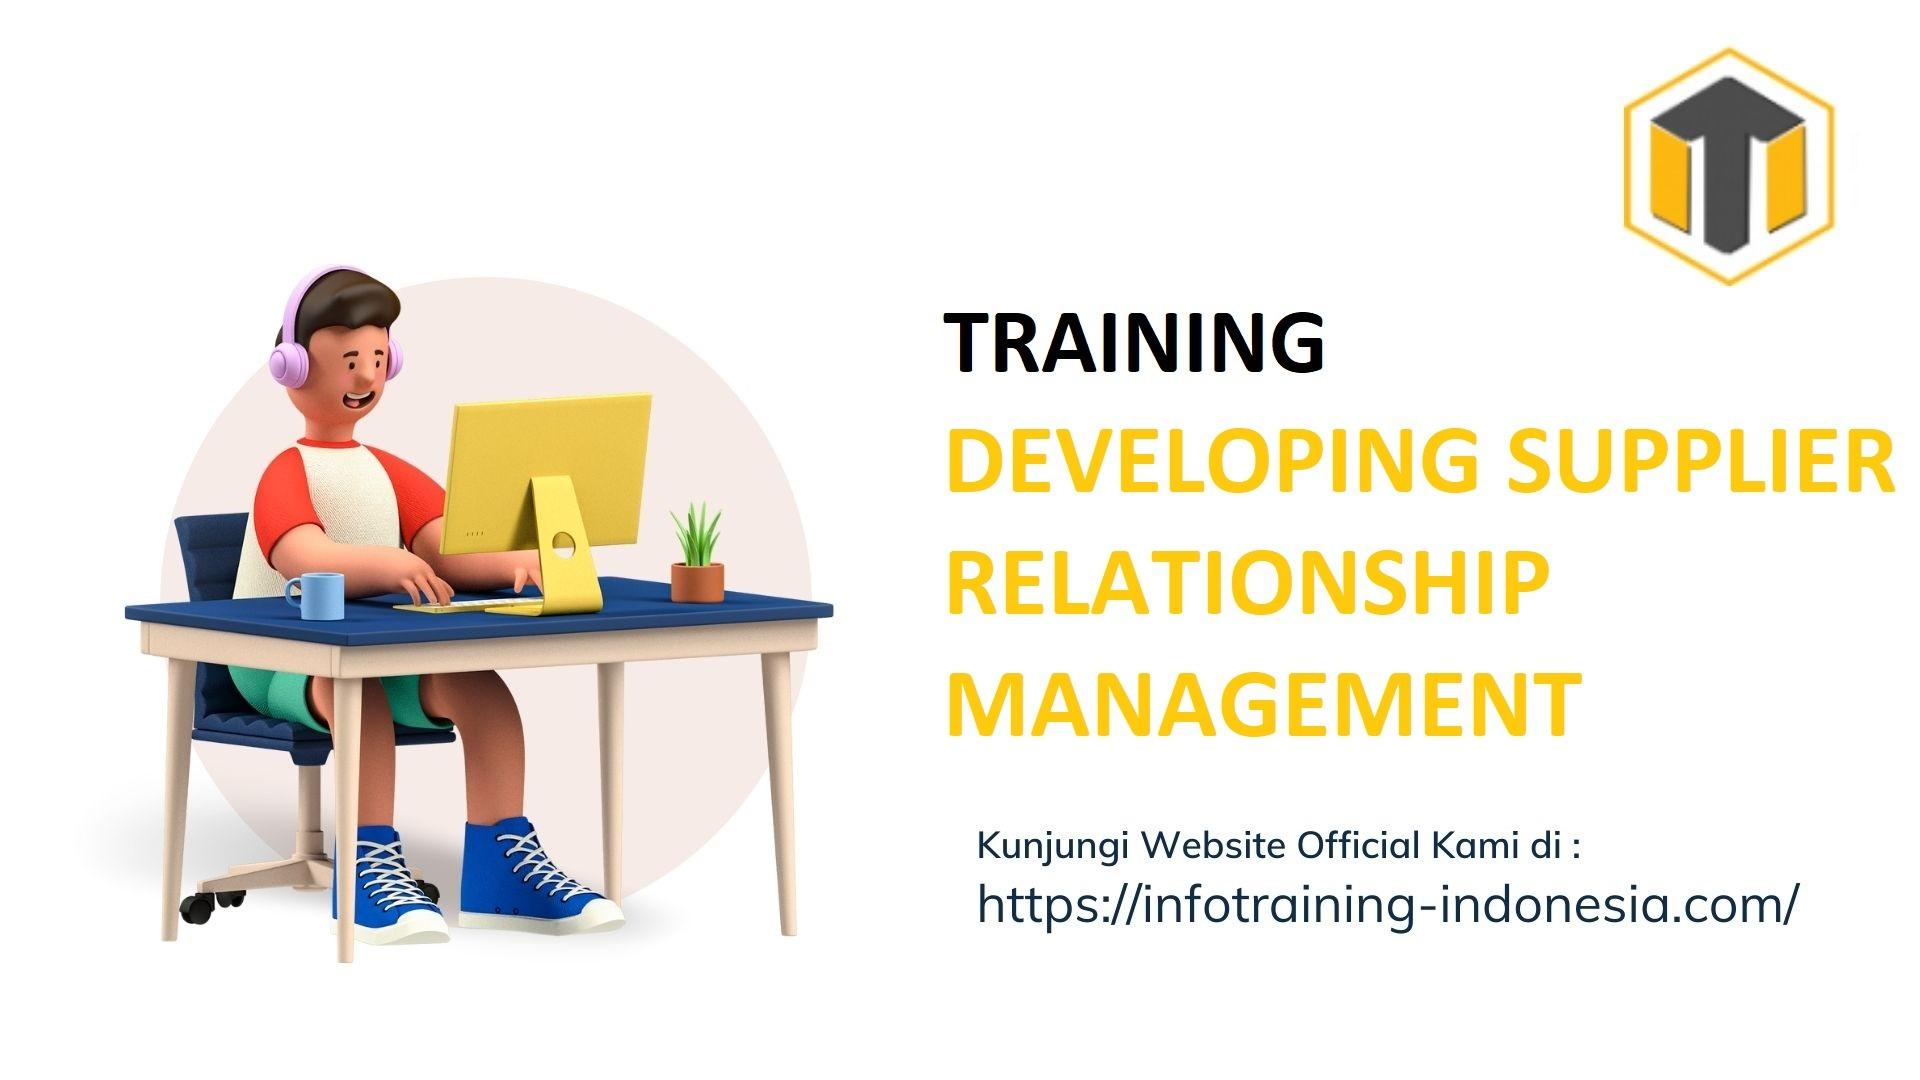 TRAINING DEVELOPING SUPPLIER RELATIONSHIP MANAGEMENT Manajemen